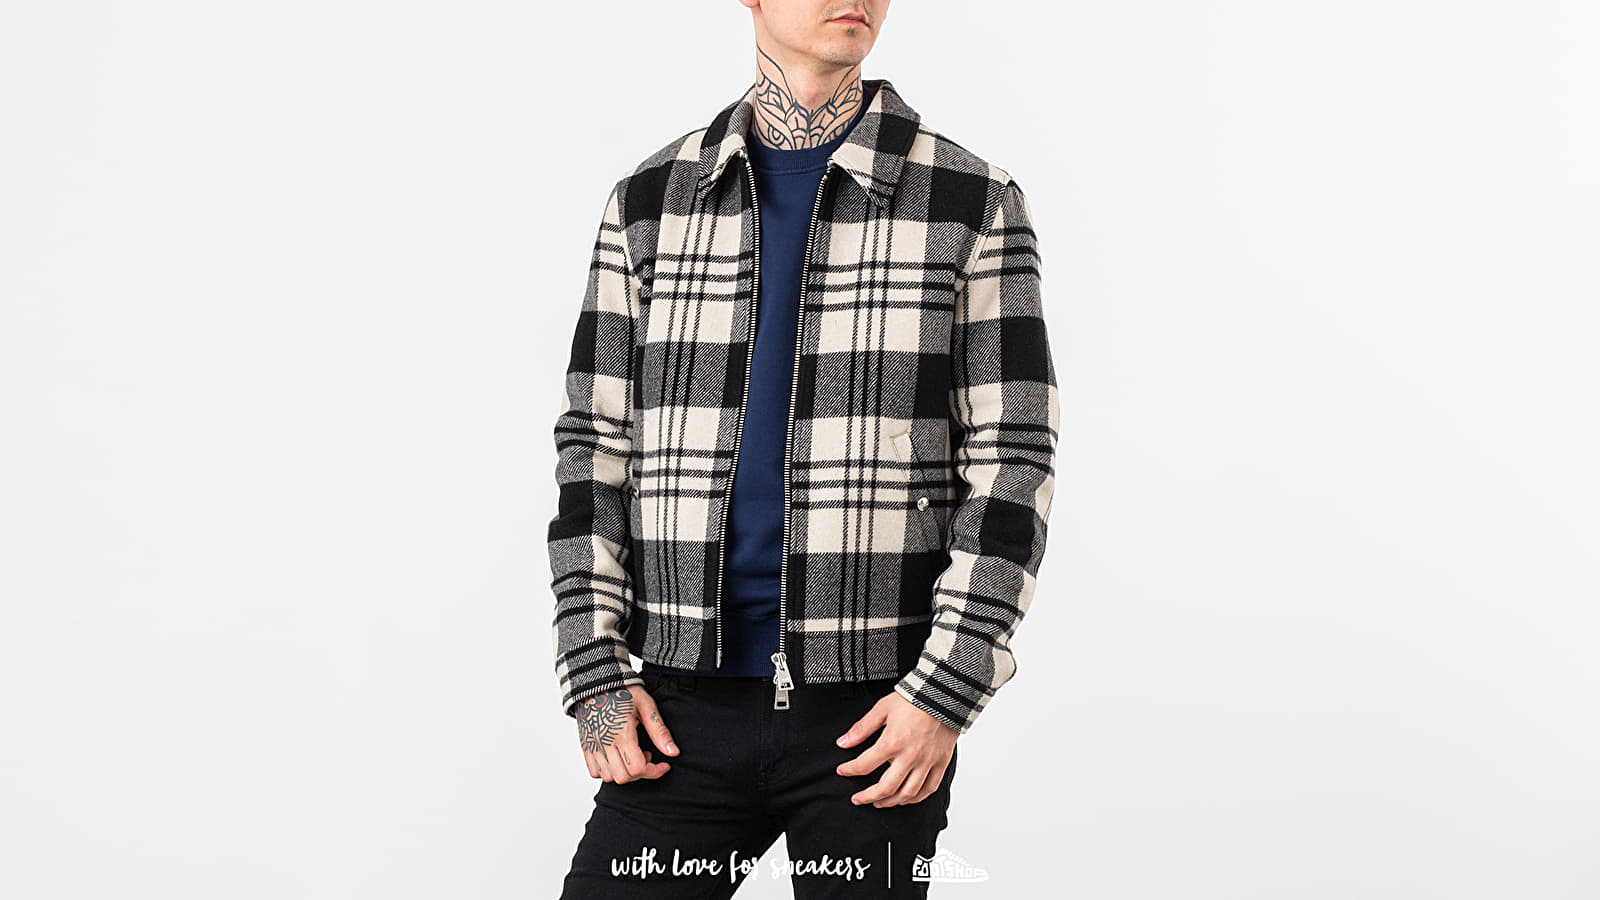 Bundy Alexandre Mattiussi Snap Buttoned Zipped Jacket White/ Black